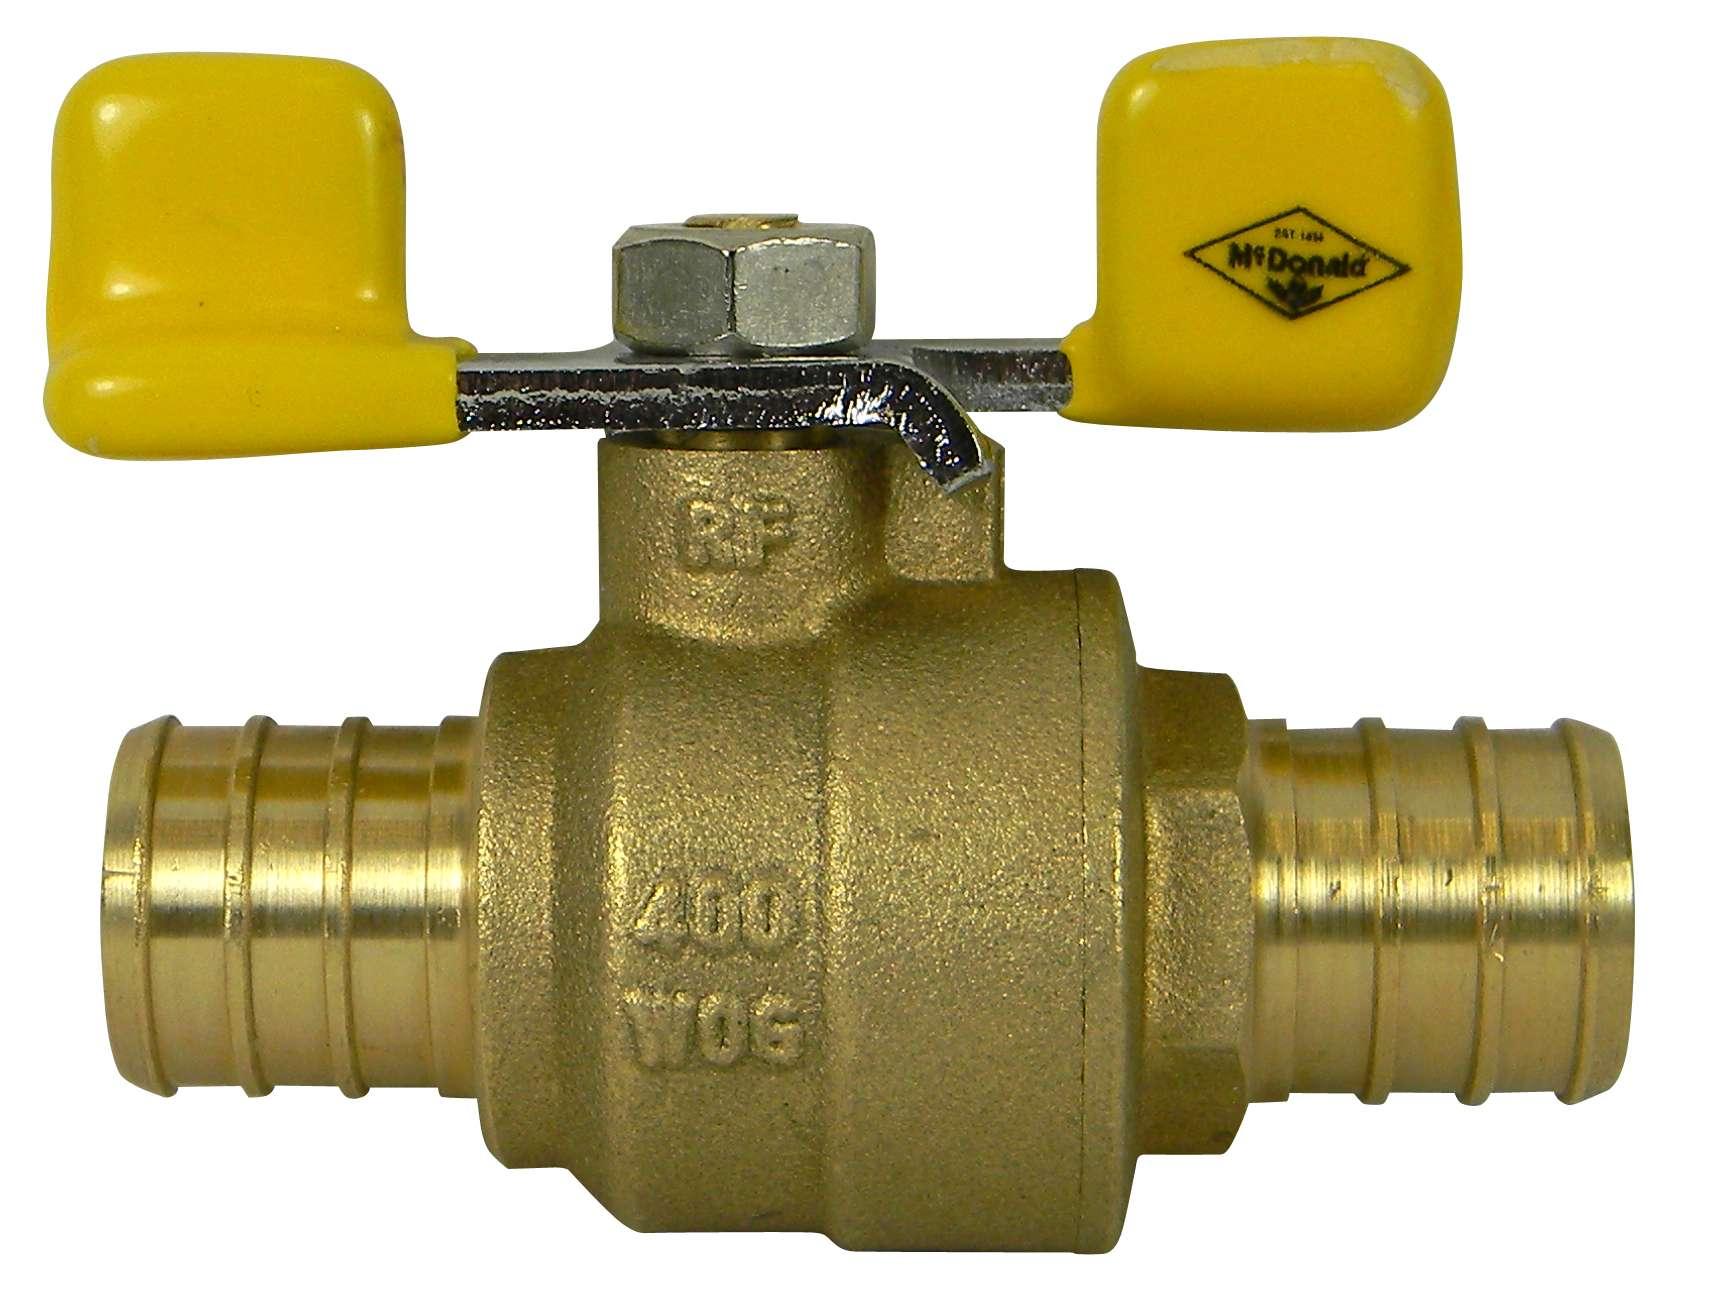 New Products Plumbing Supplies Mcdonald